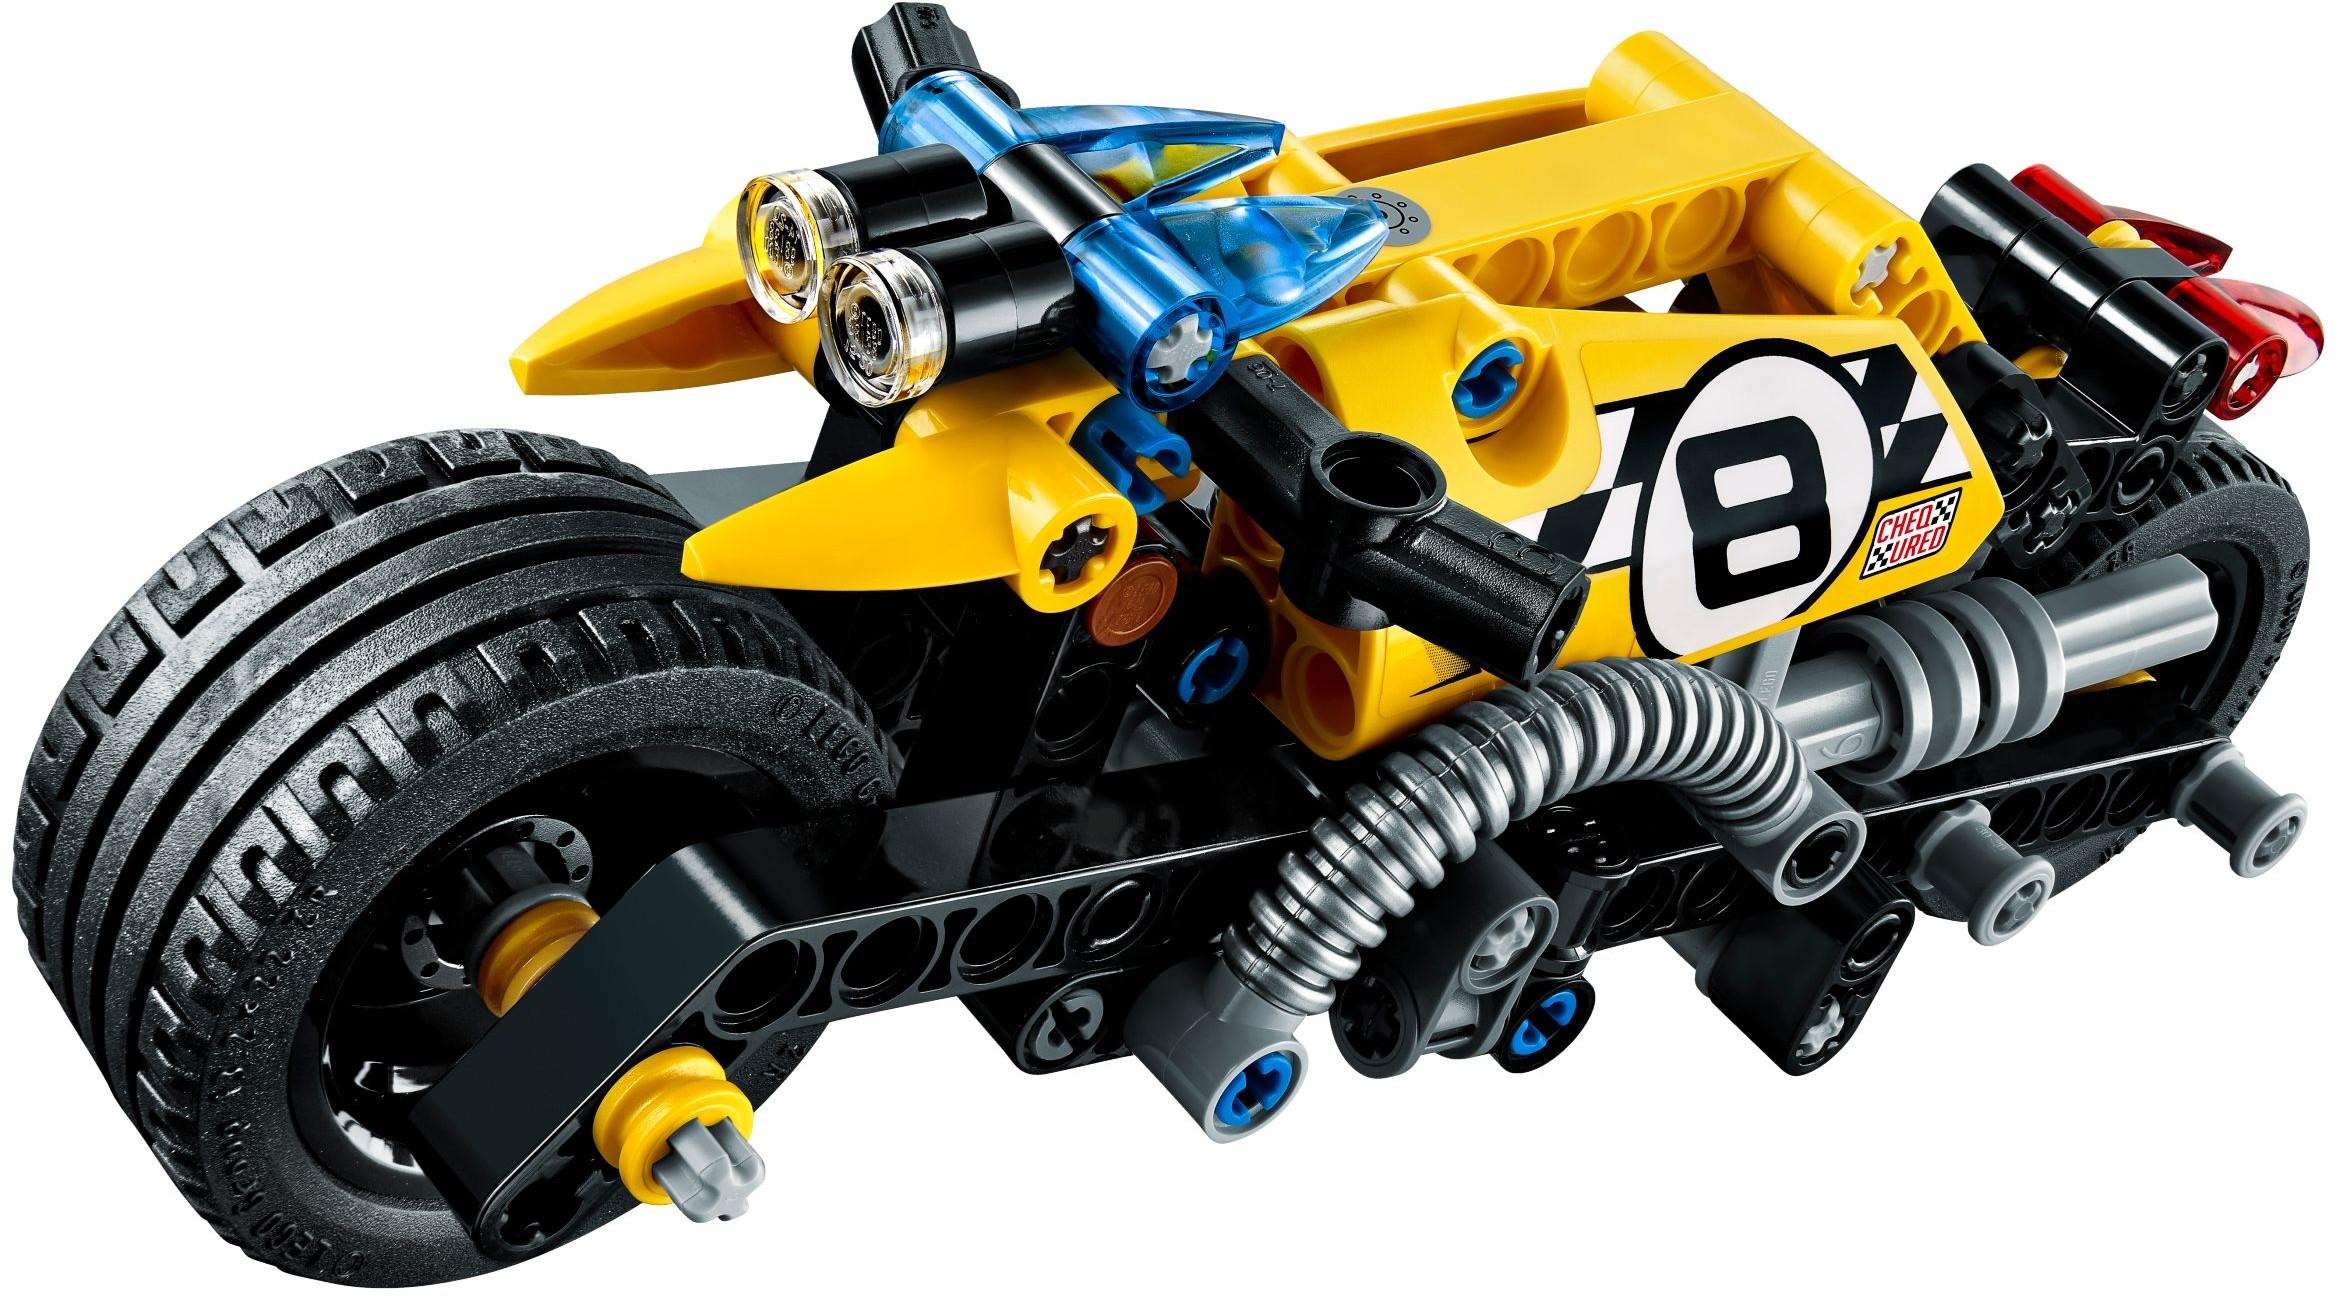 Mua đồ chơi LEGO 42058 - LEGO Technic 42058 - Siêu Mô Tô Biểu Diễn (LEGO Technic Stunt Bike 42058)